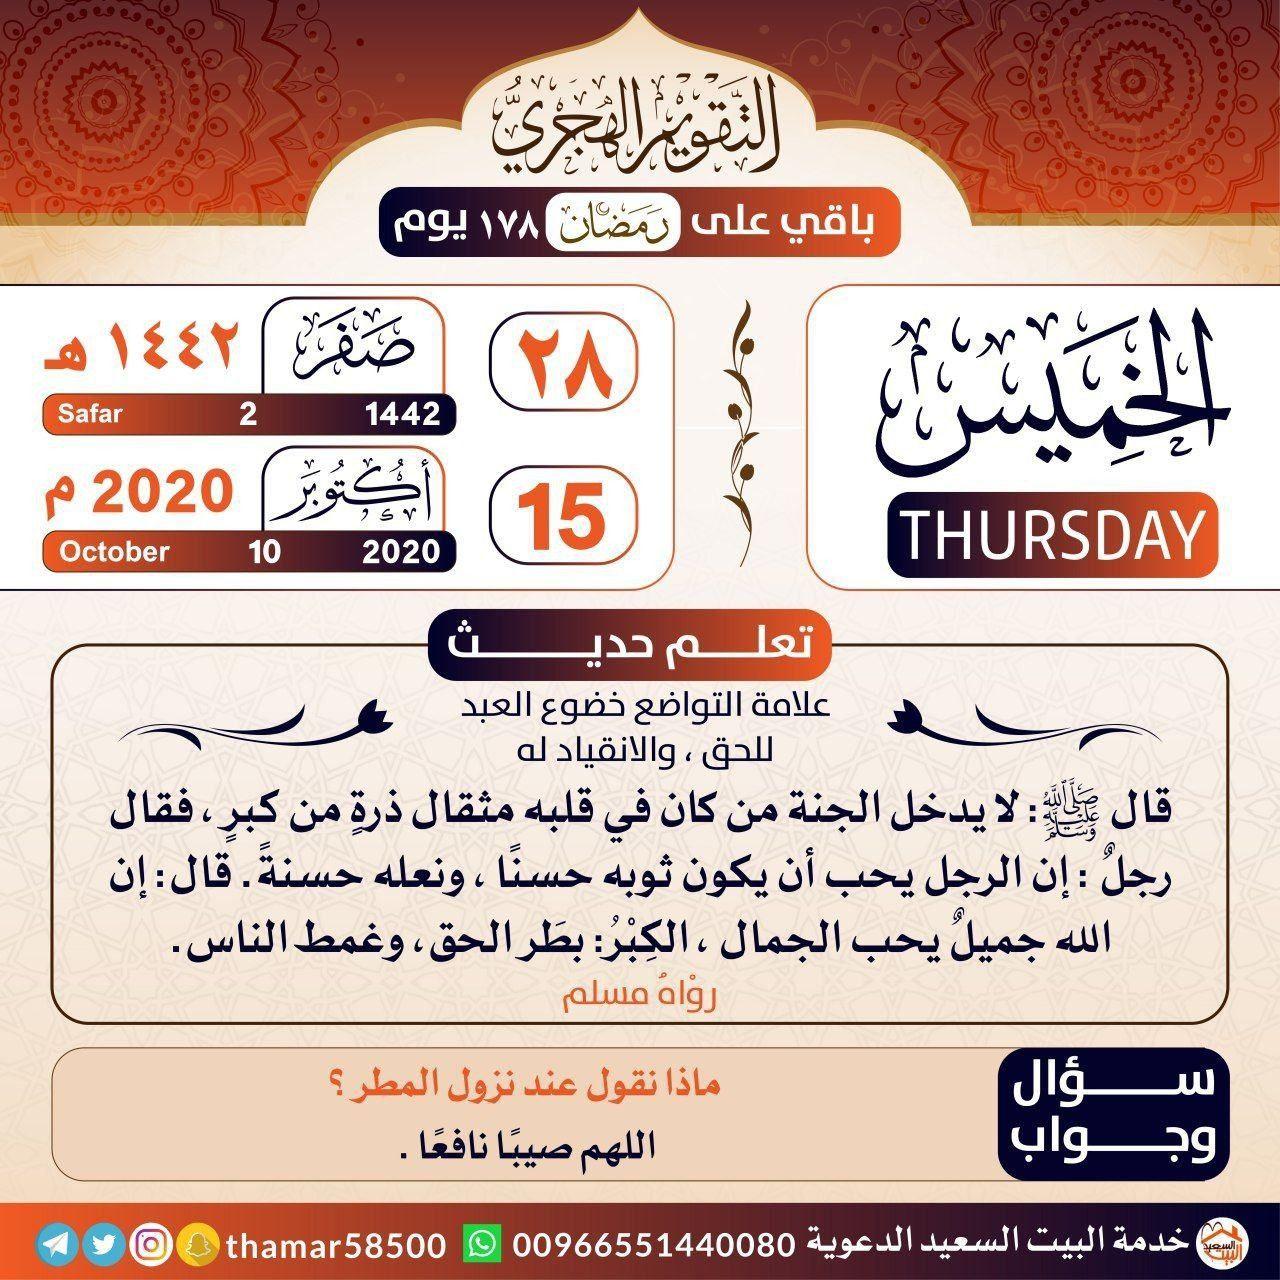 Pin By Marwa Amin On التقويم الهجري October 10 November 11 10 Things